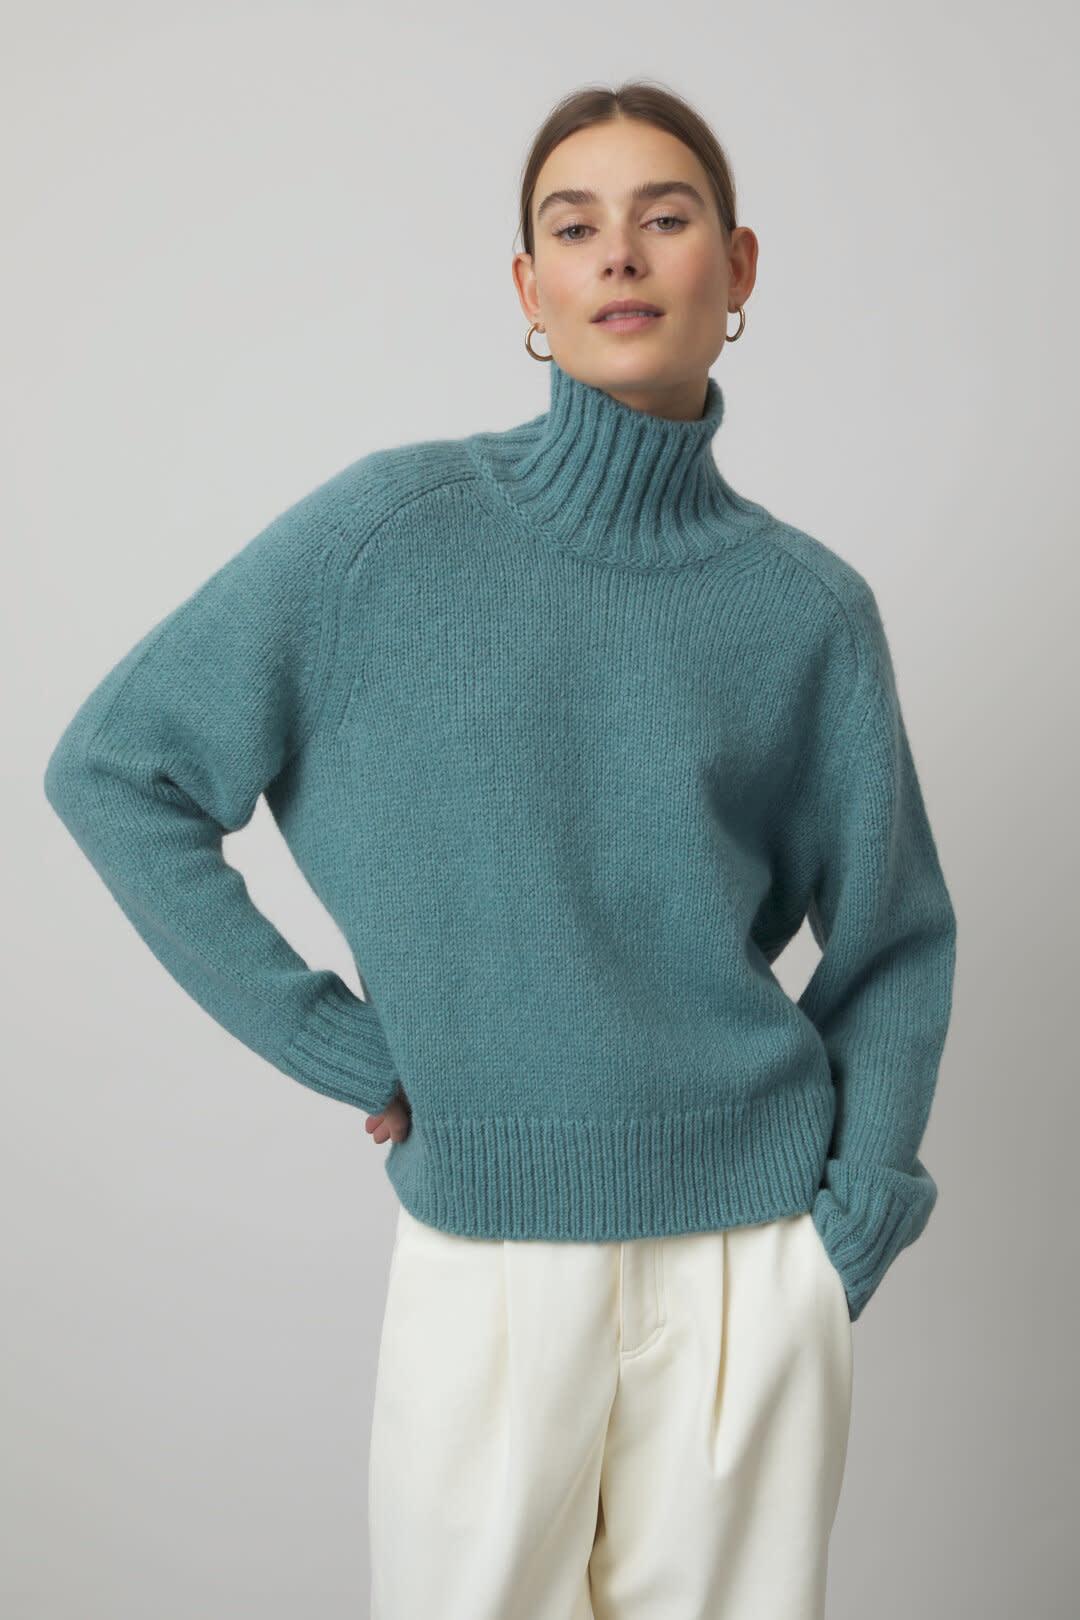 Alpaca Mix Knit Sweater - Teal-1